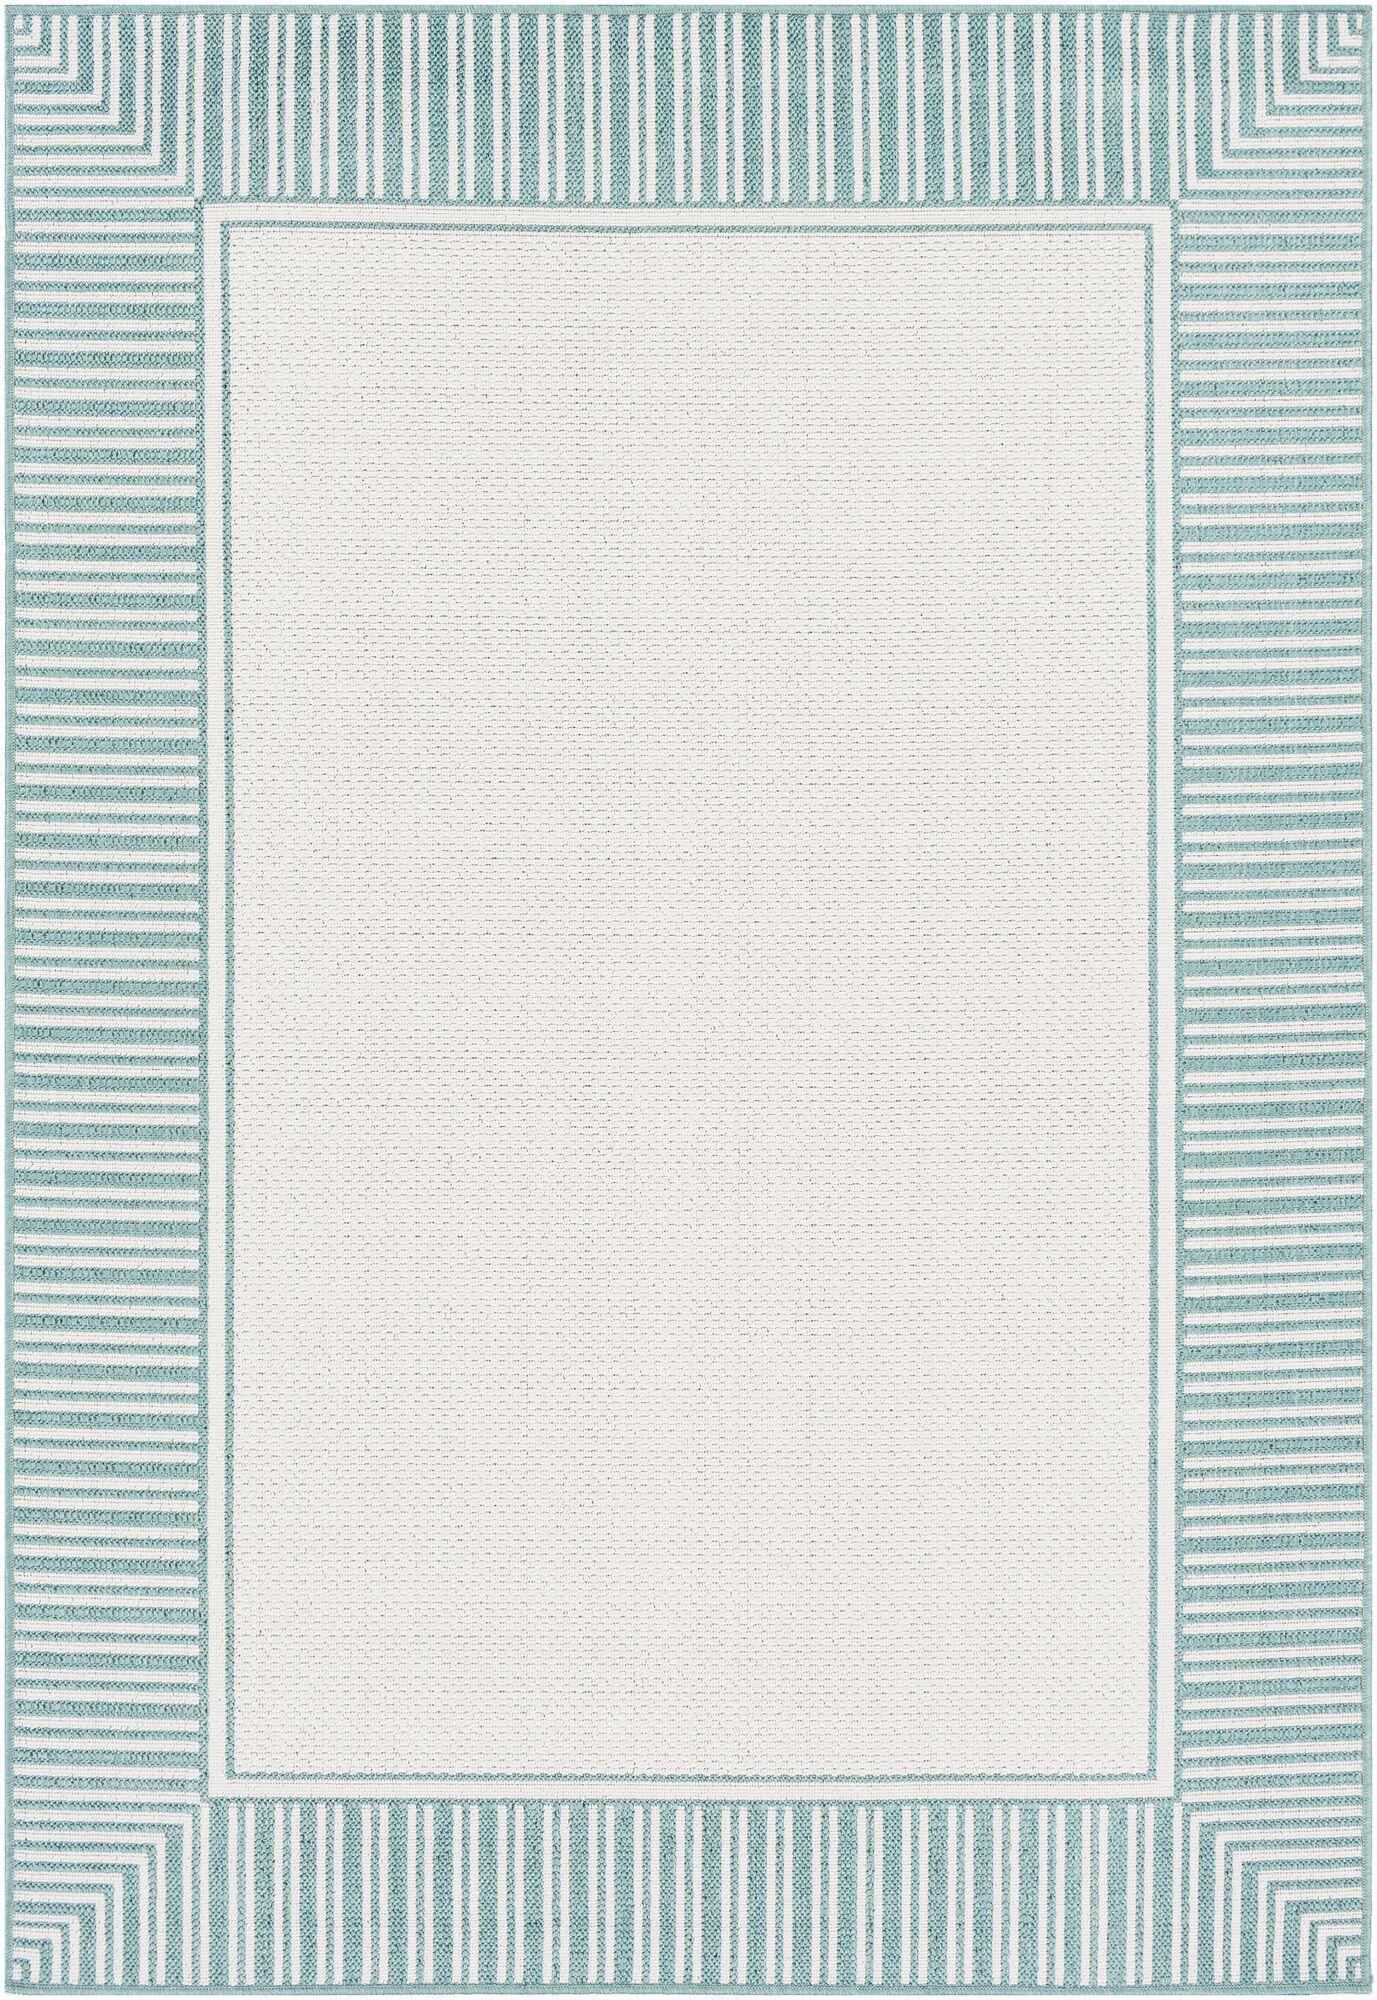 Oliver Teal Indoor/Outdoor Area Rug Rug Size: Rectangle 8'9